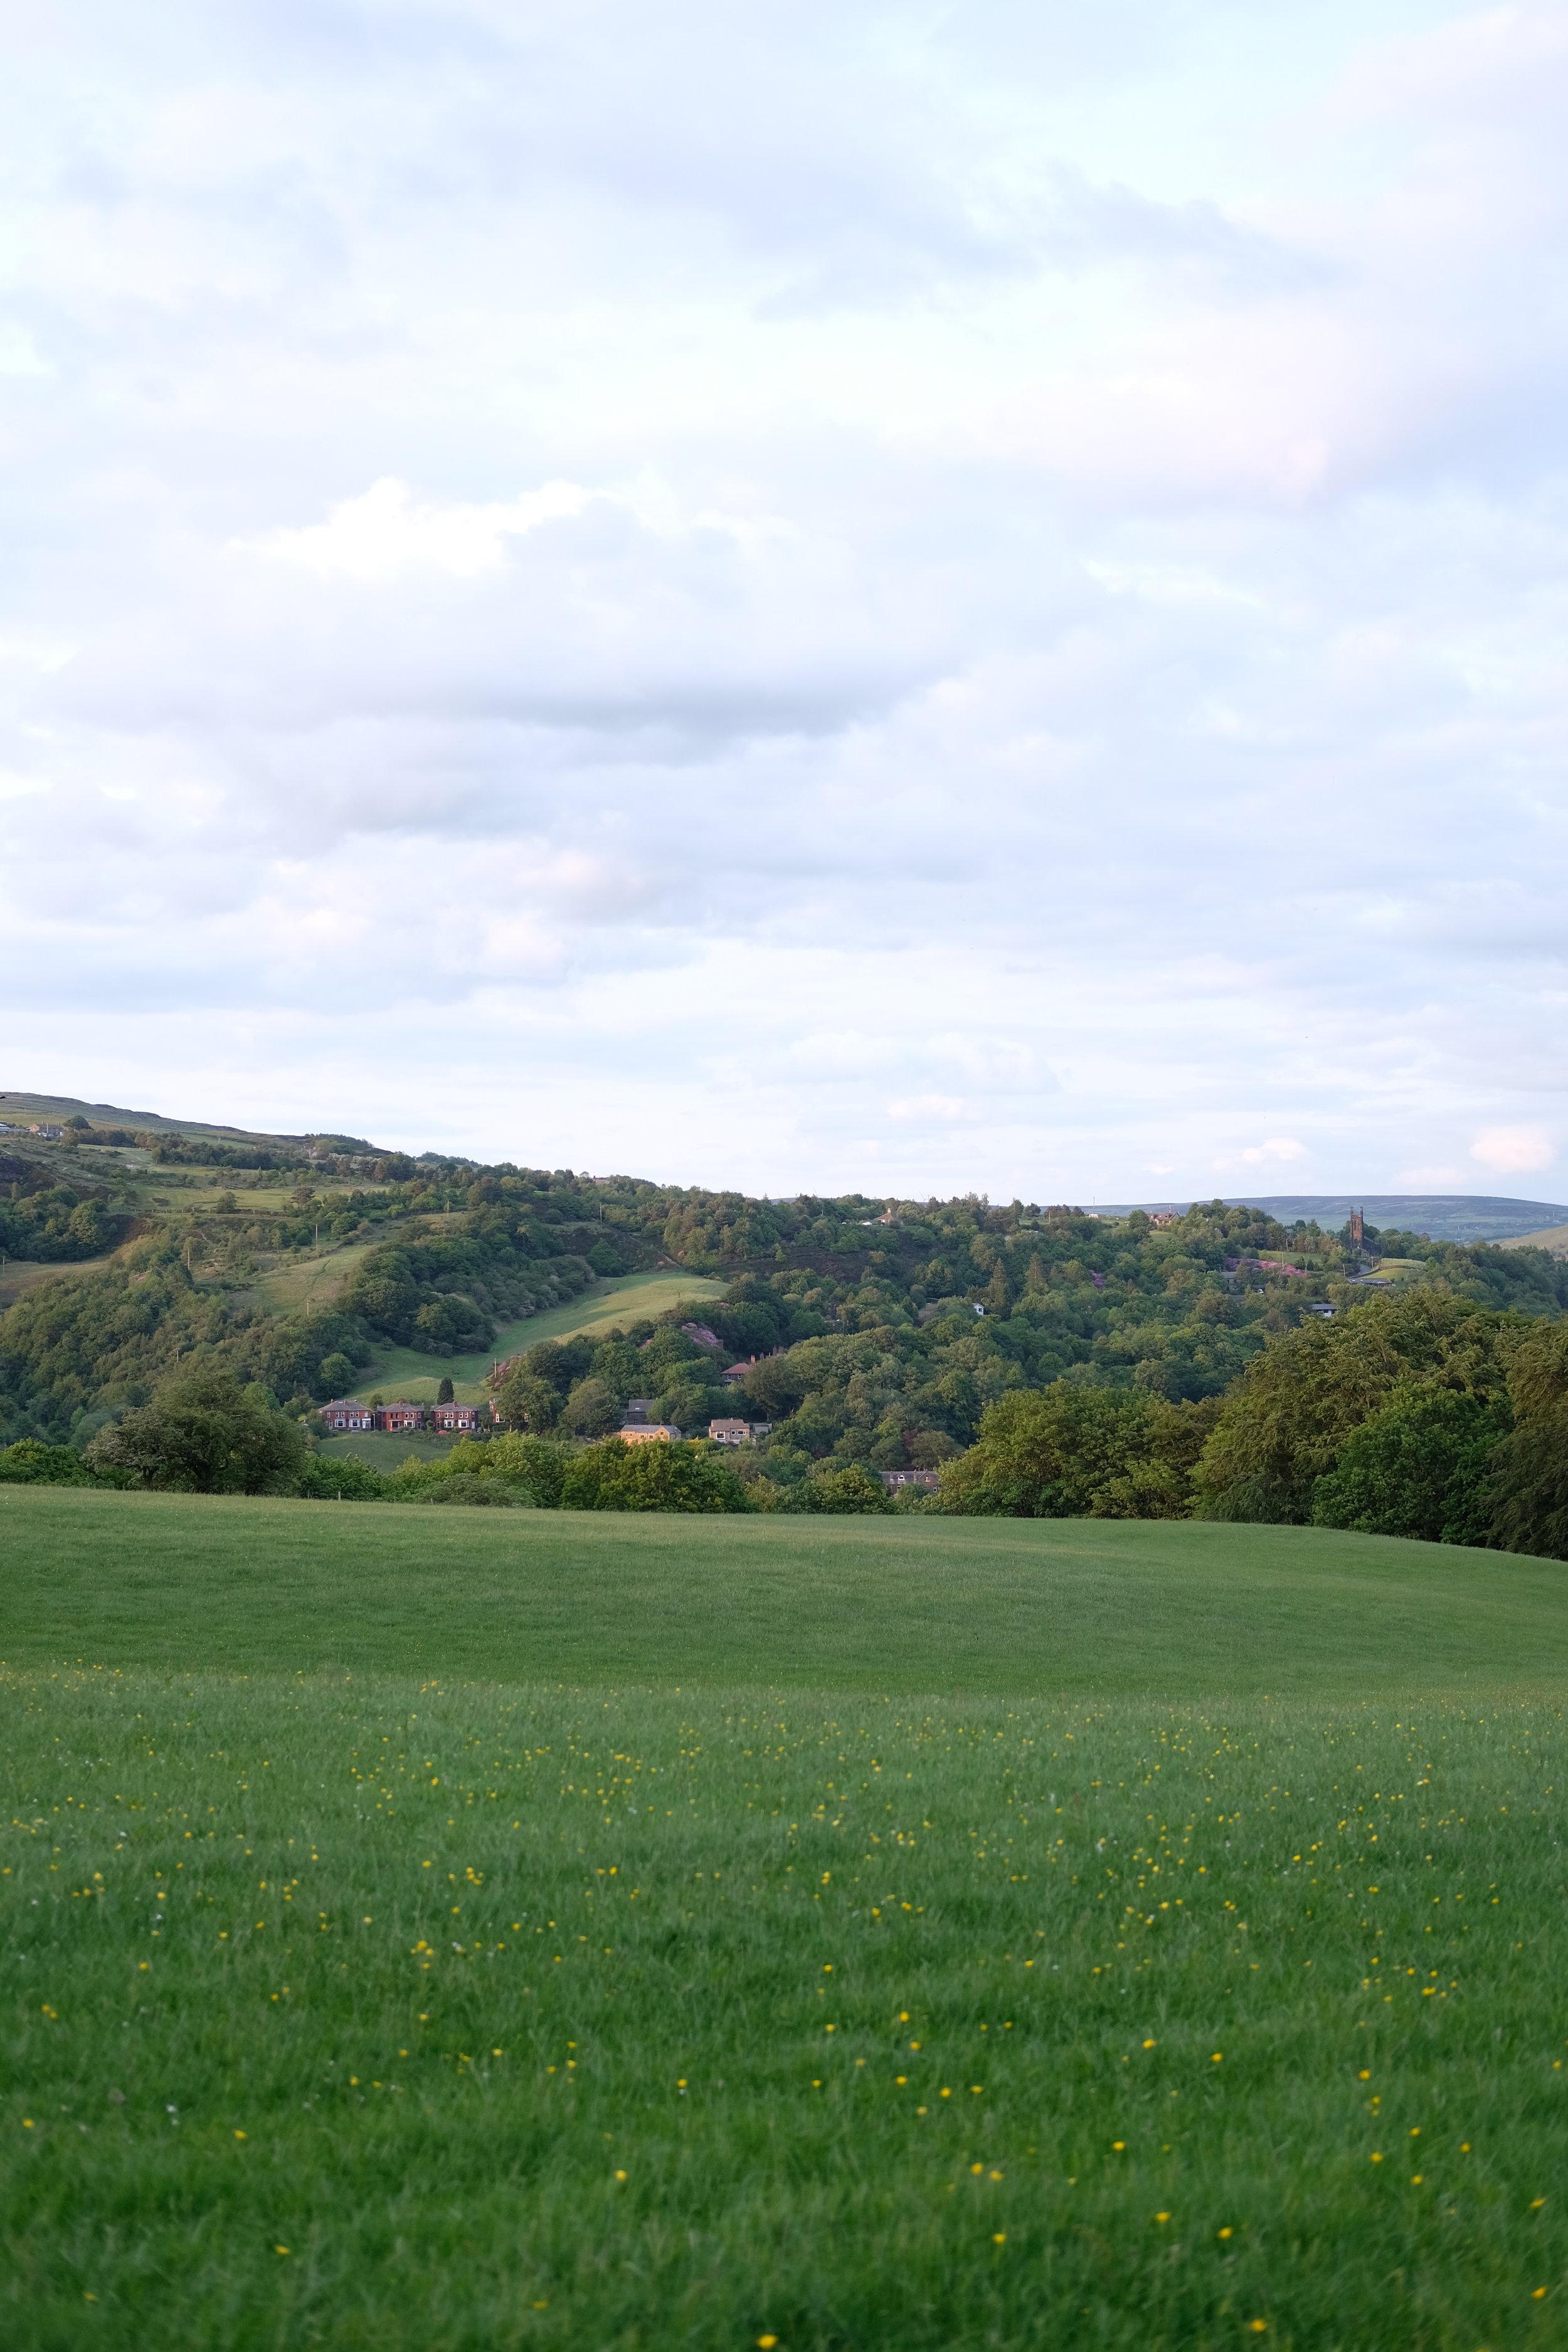 Countryside landscape | Field + Nest